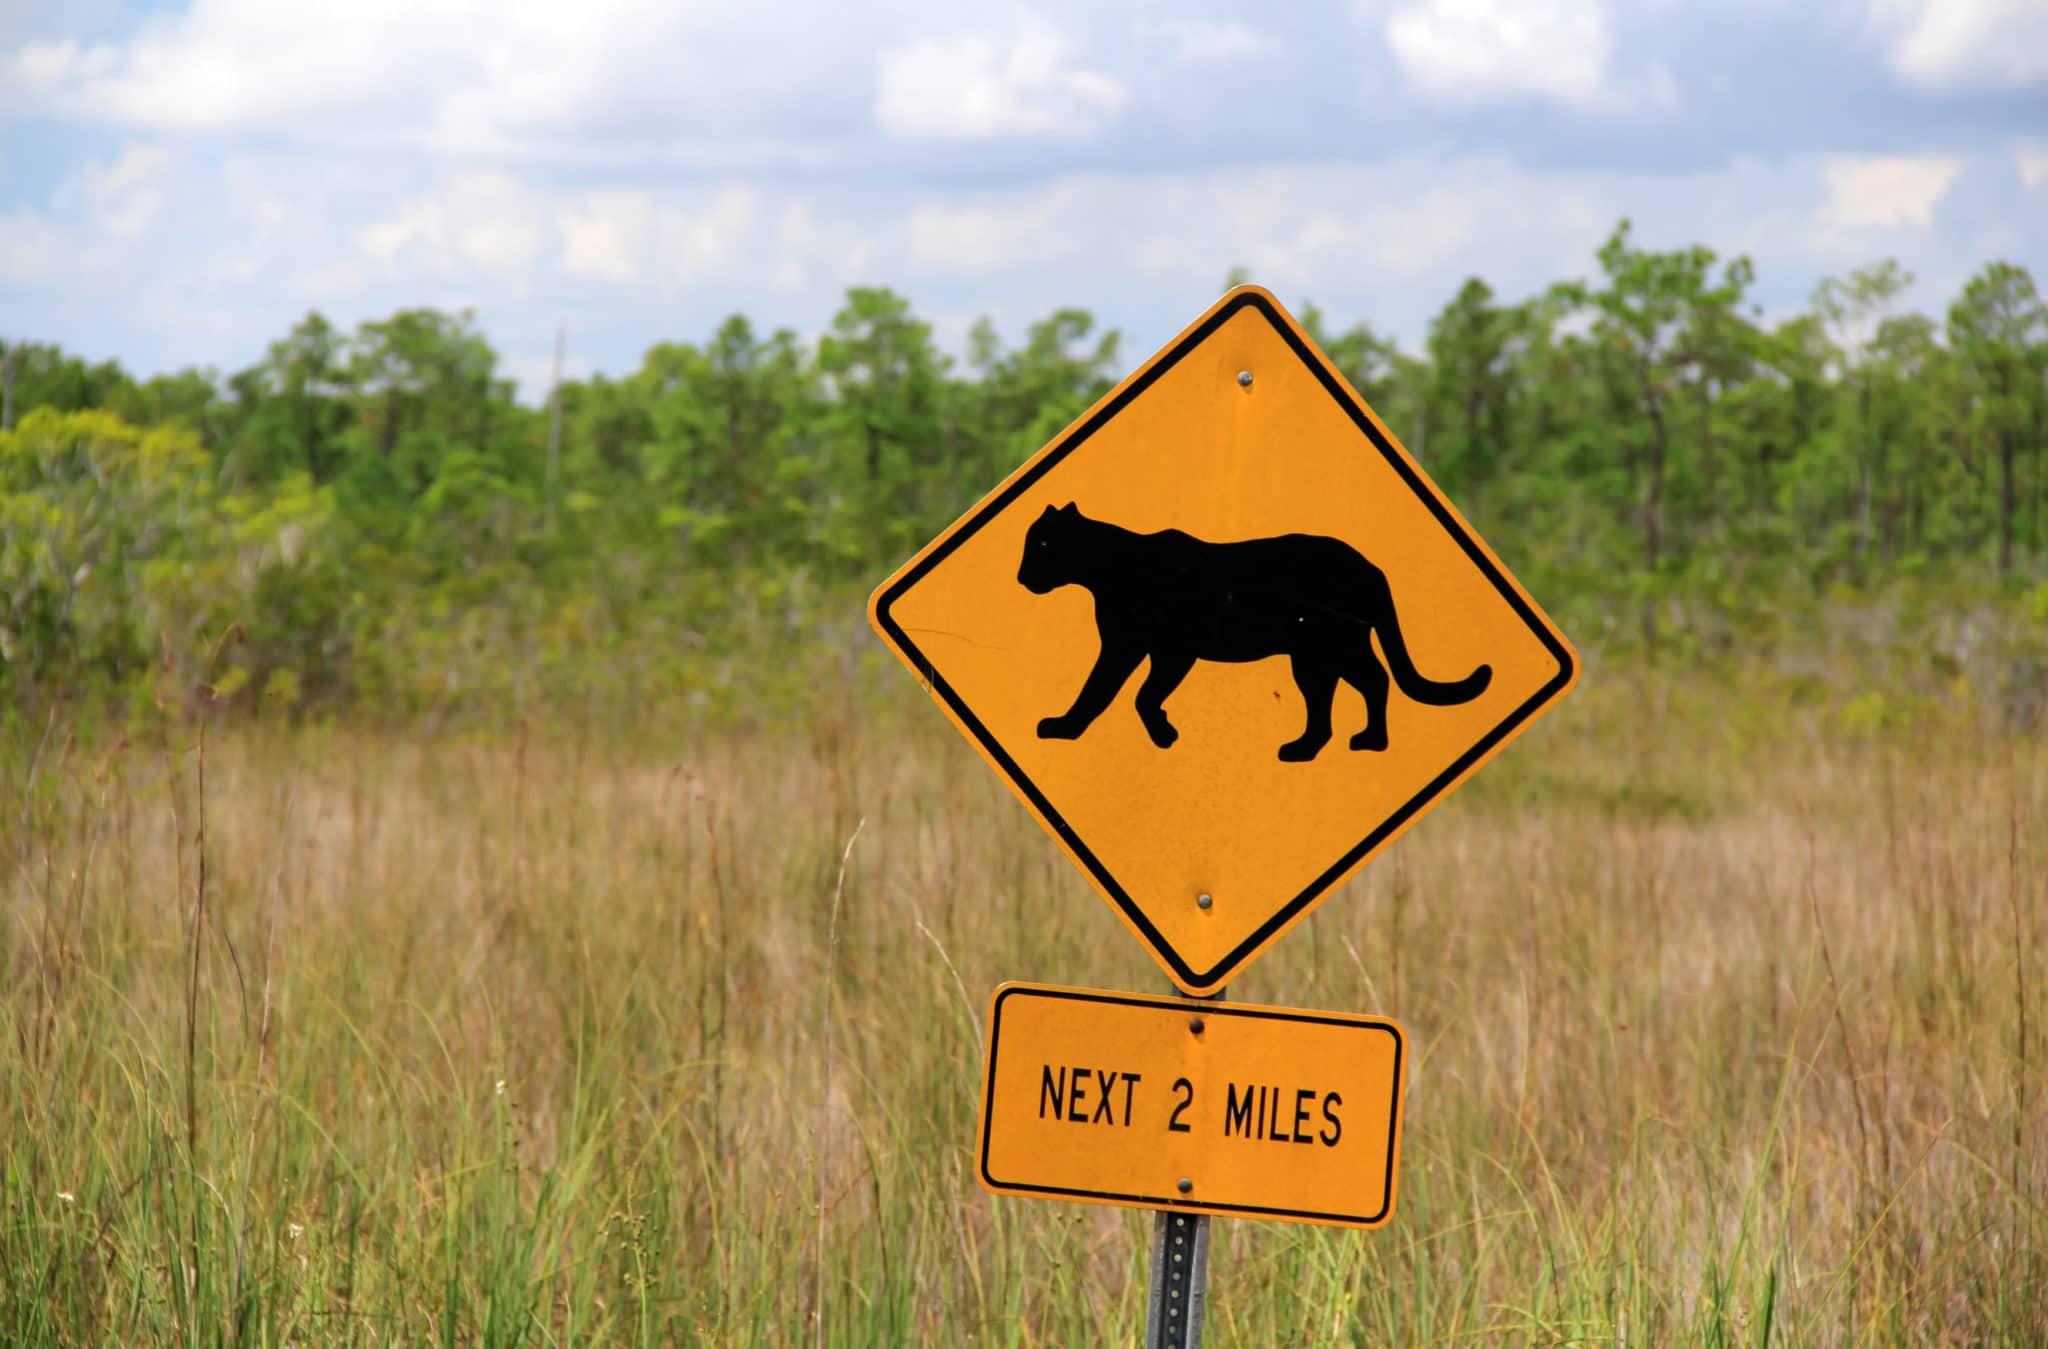 Leg Priorities Tile - Panther Crossing Everglades